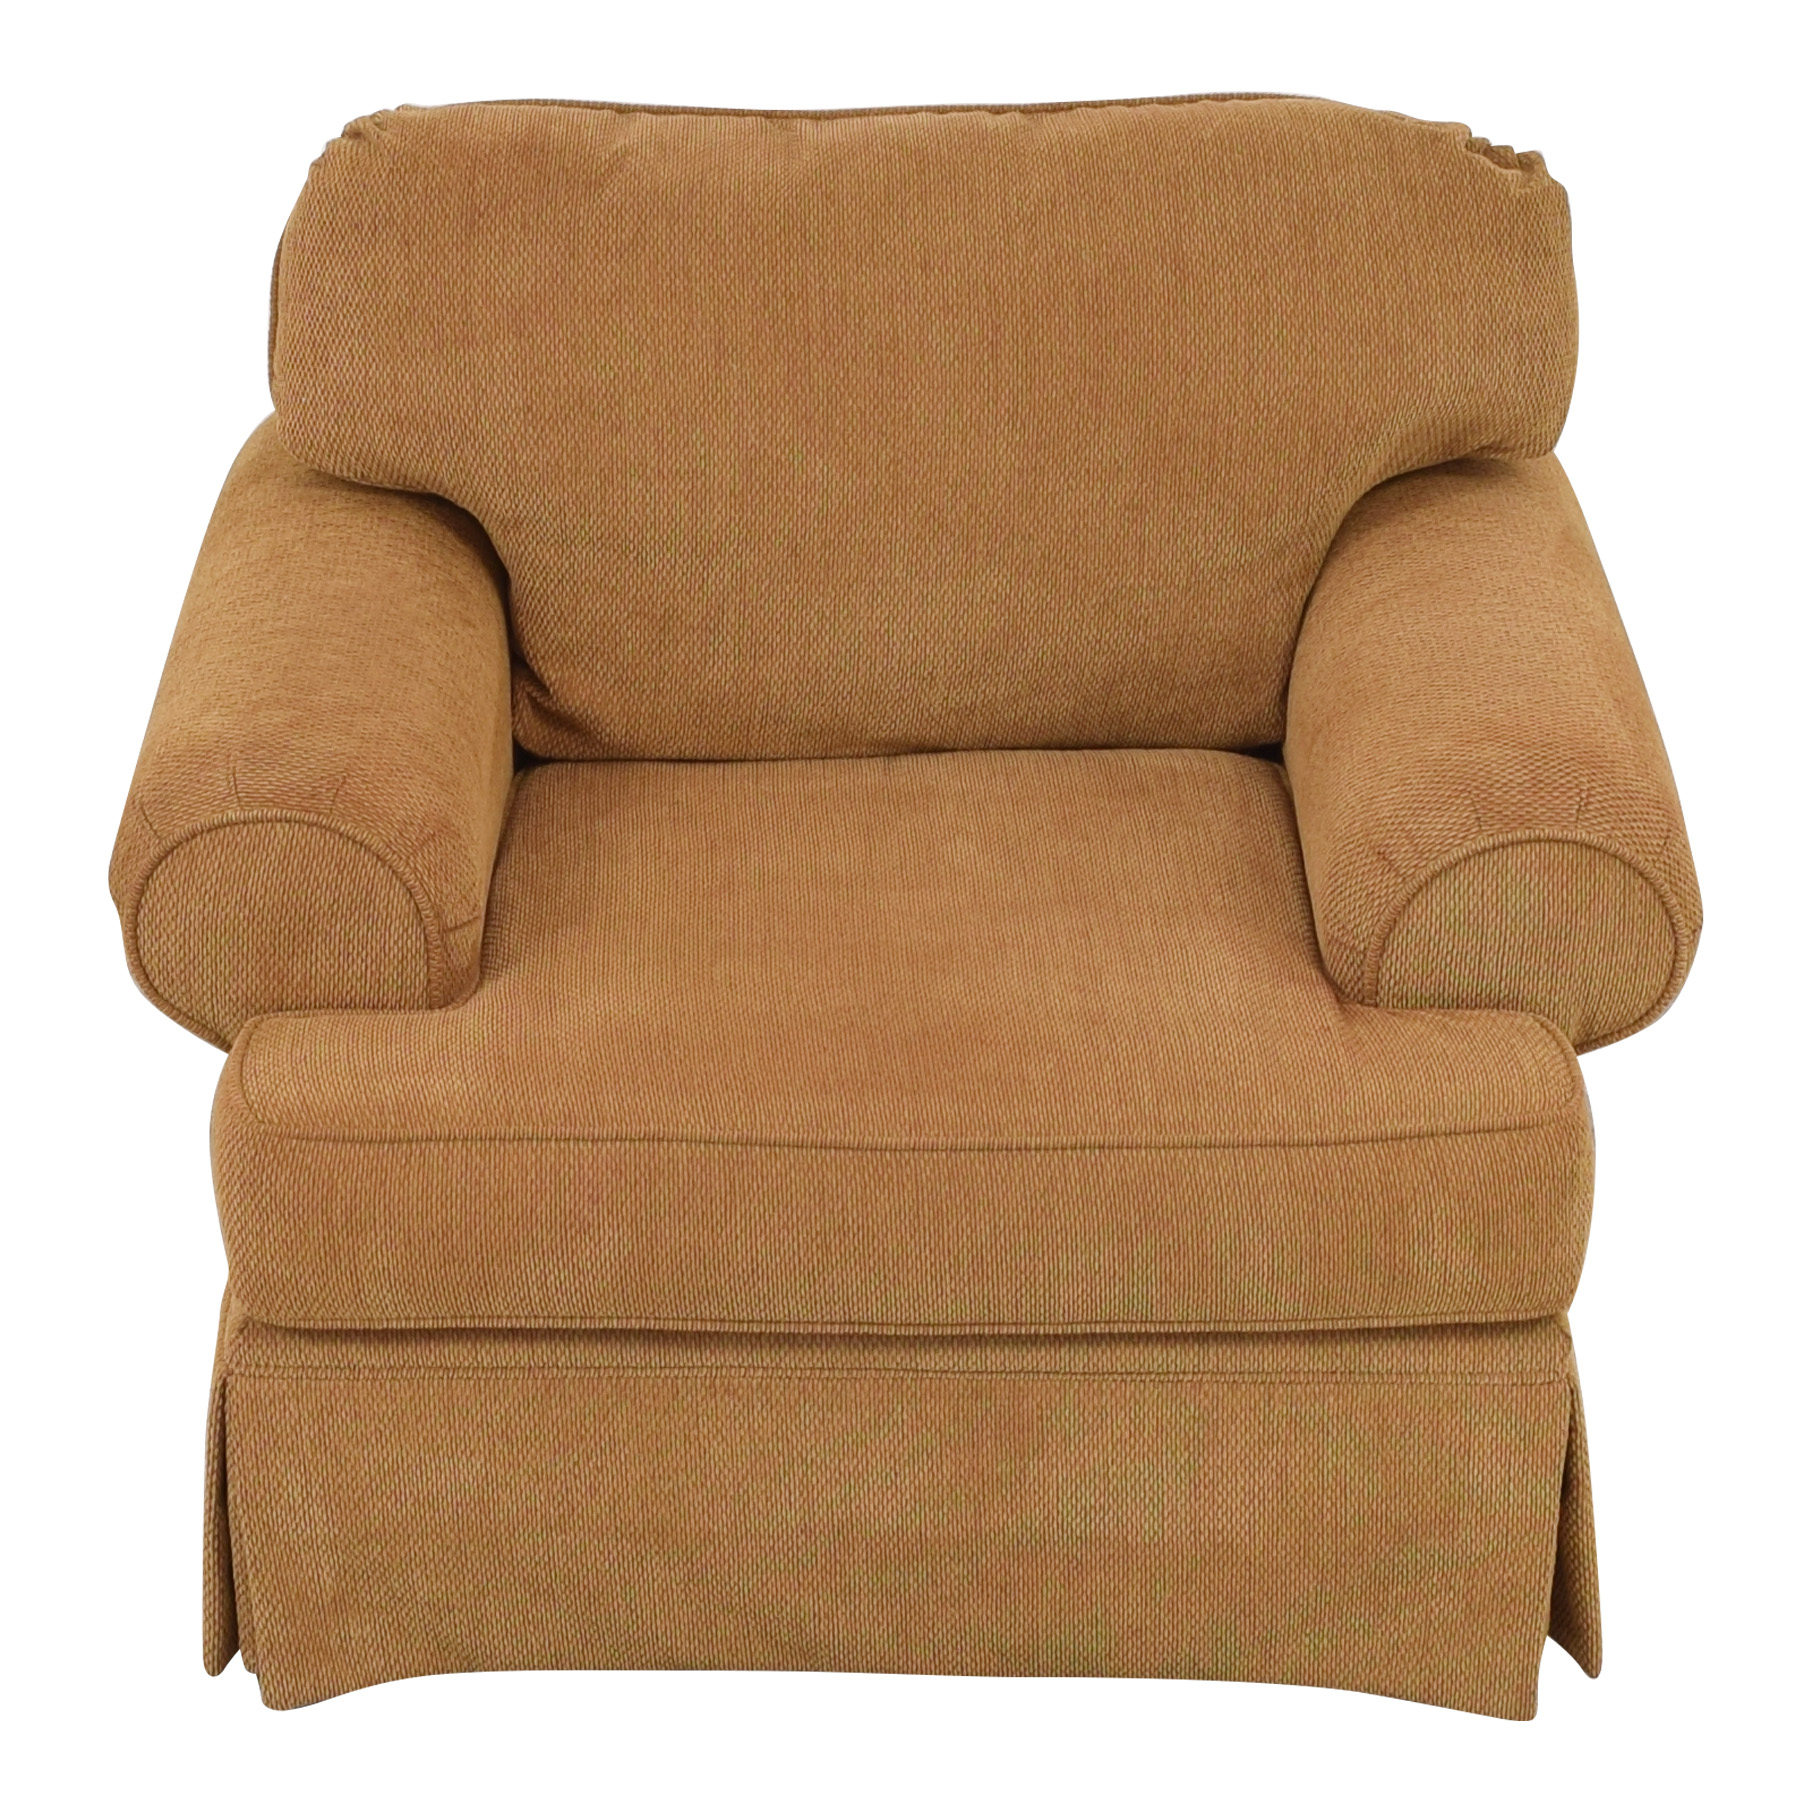 Oversized Club Chair beige